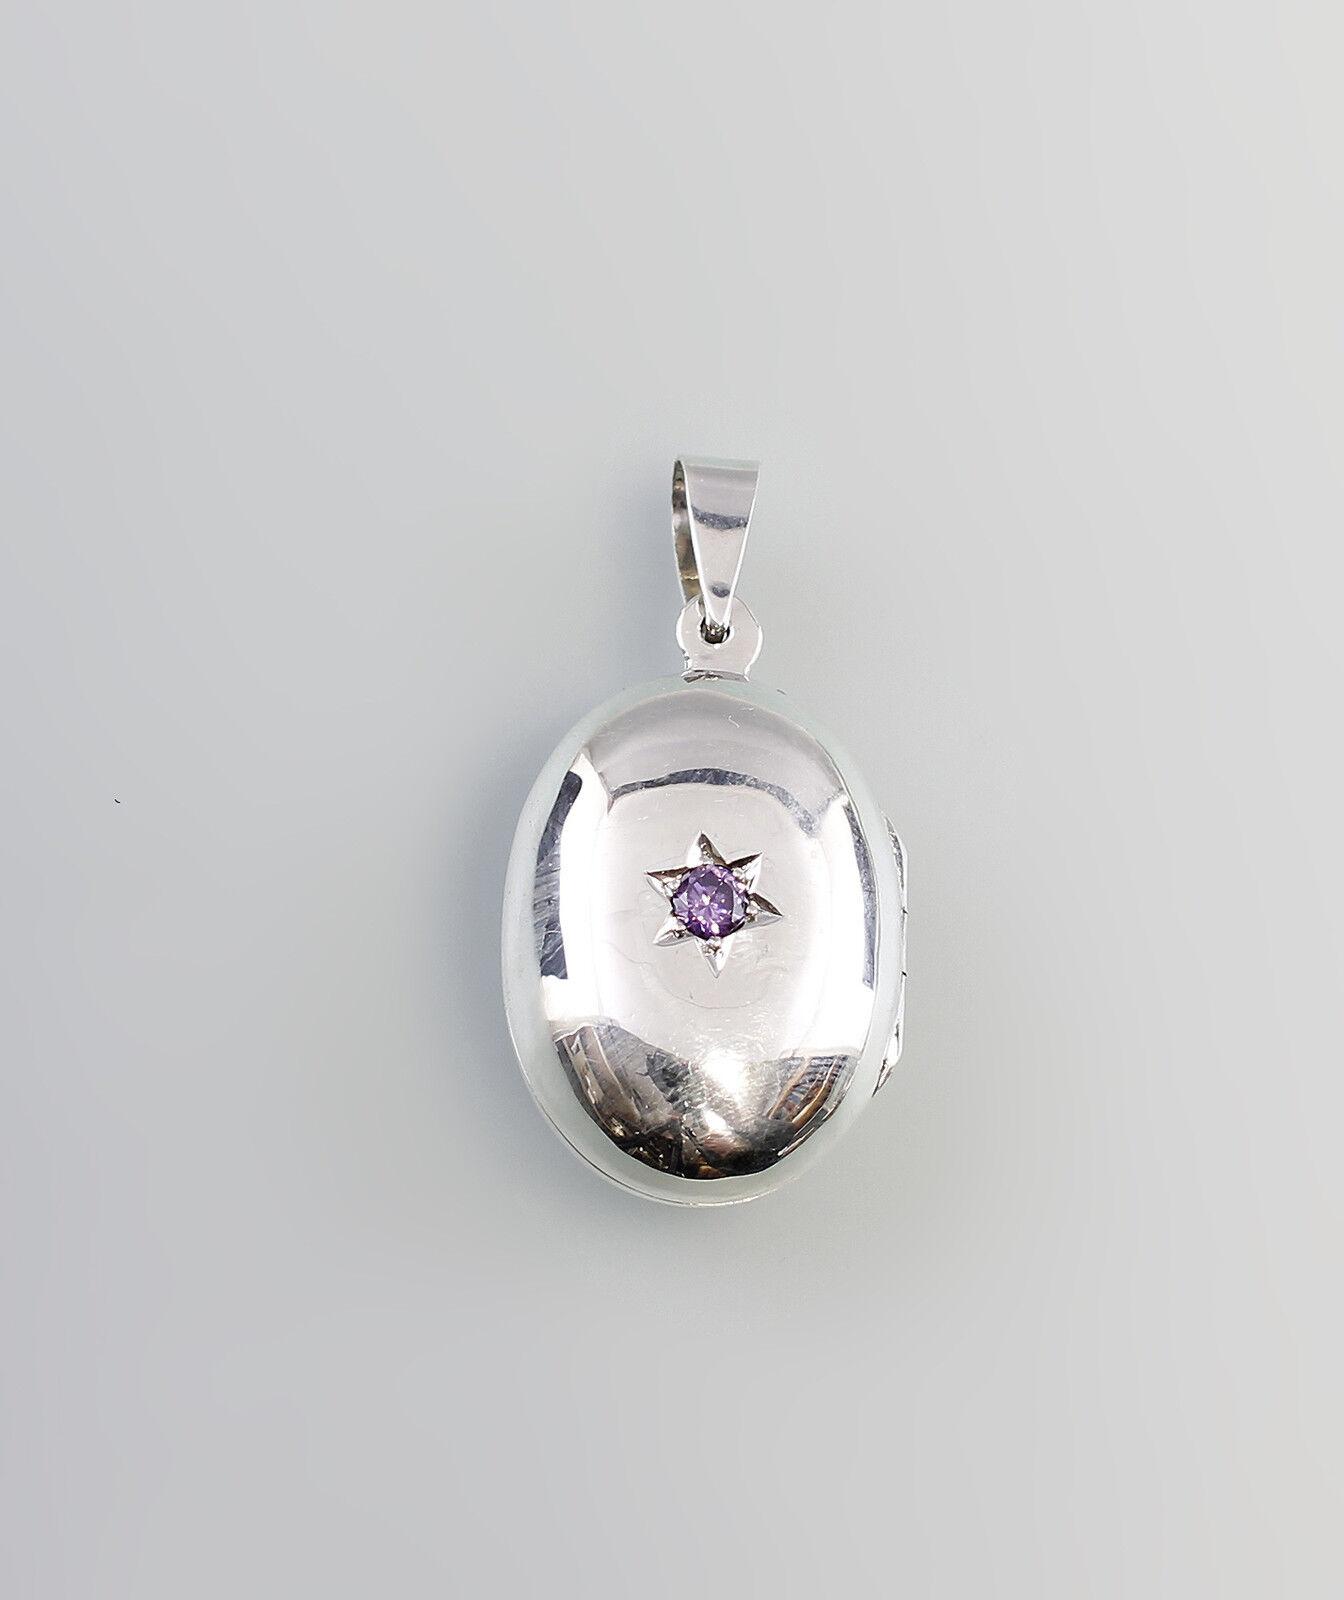 925er silver modischer Medaillon-Anhänger mit Amethyst  9907189